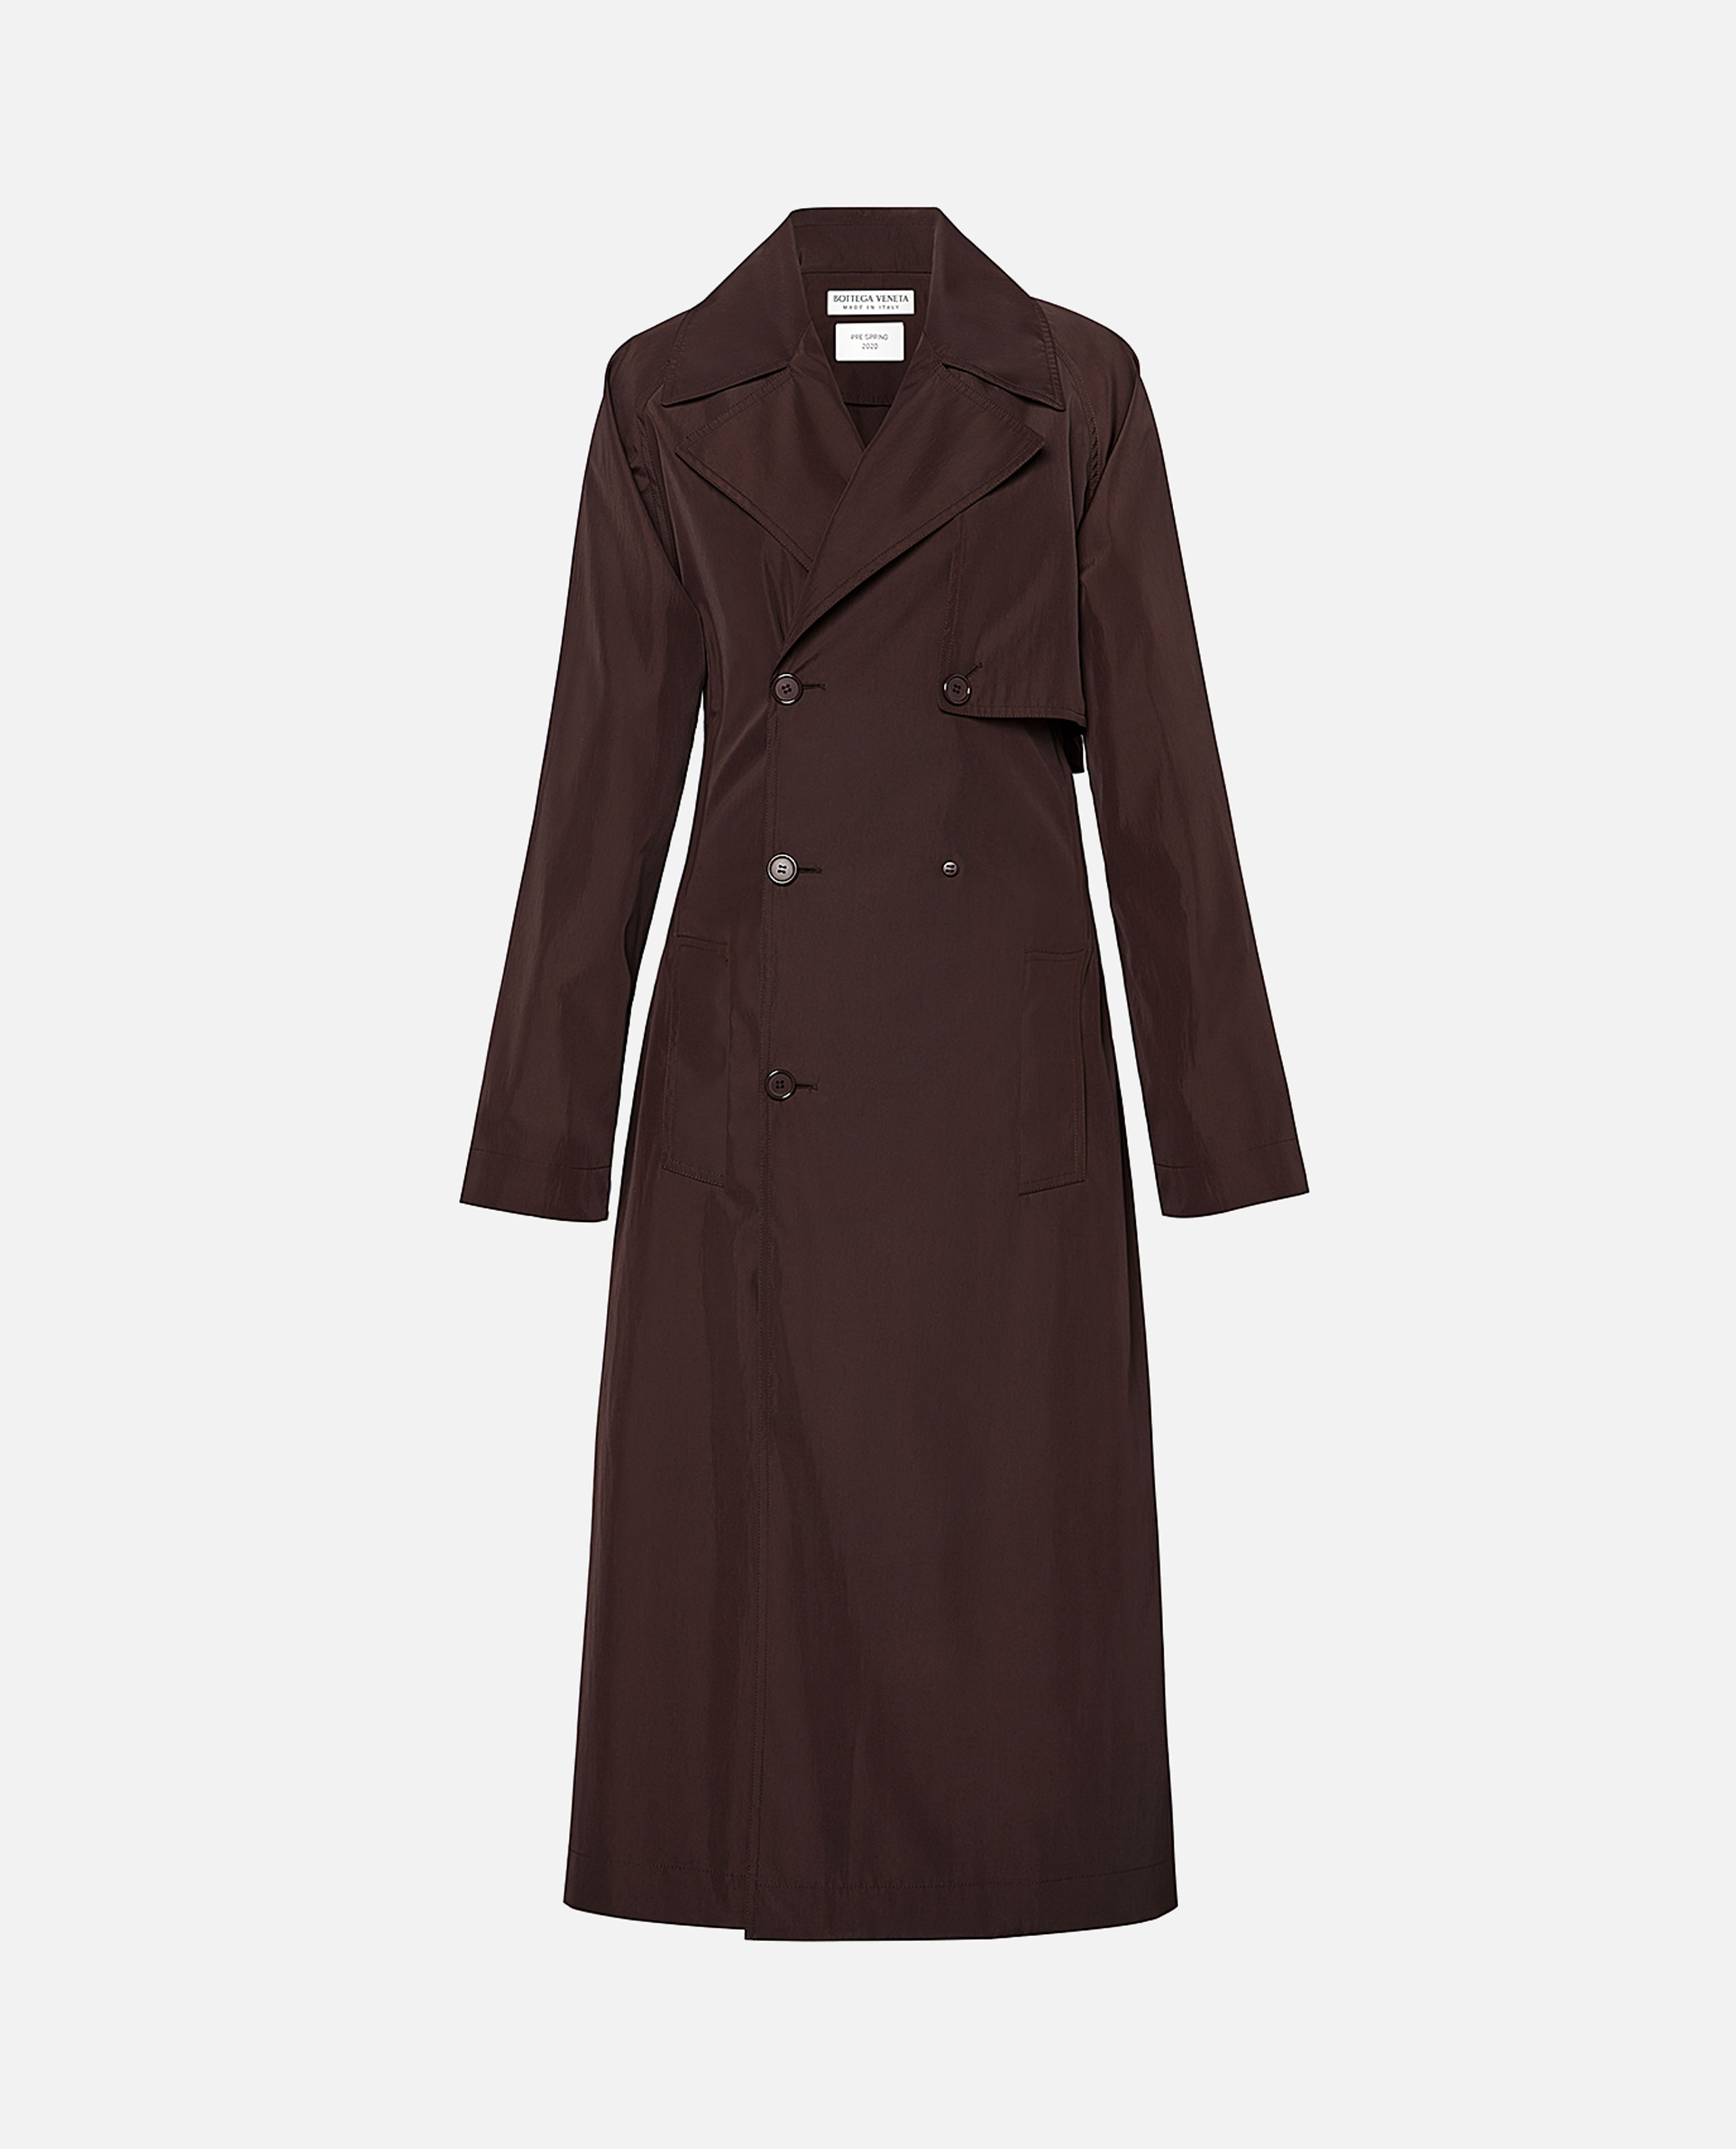 Oxblood trench coat